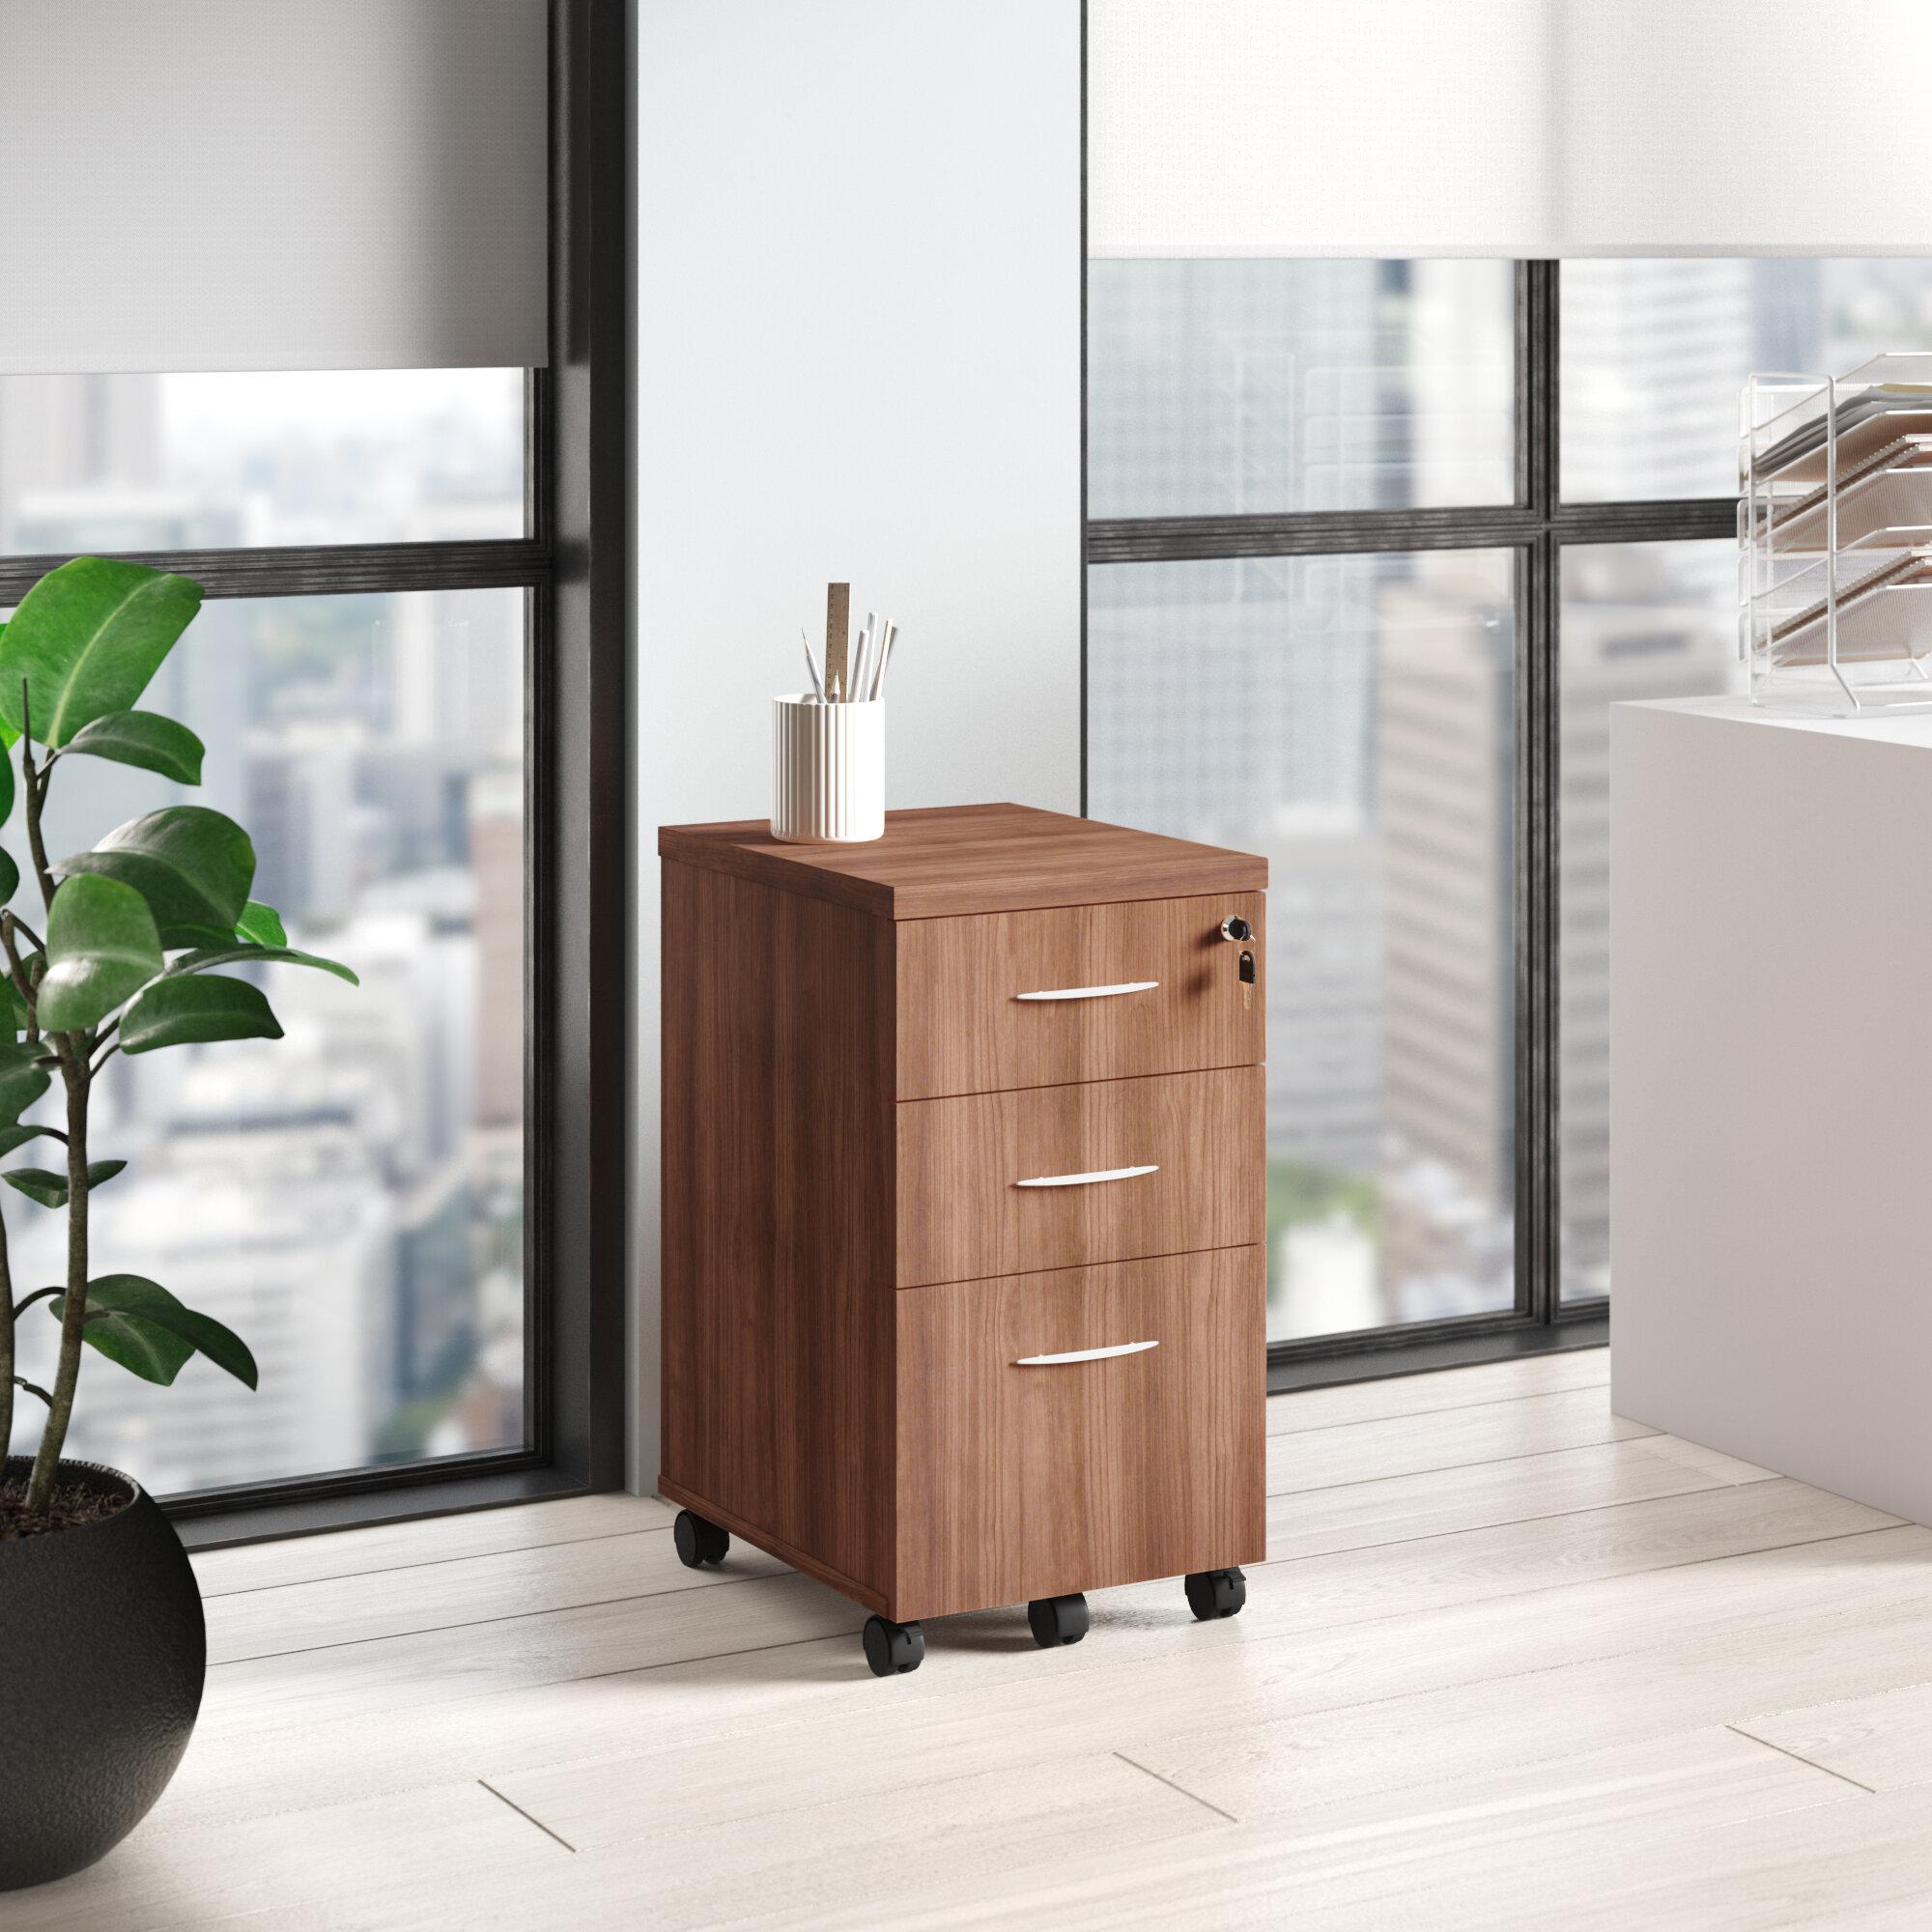 Alera Valencia Series Box Pedestal 20 Drawer Mobile Vertical Filing Cabinet